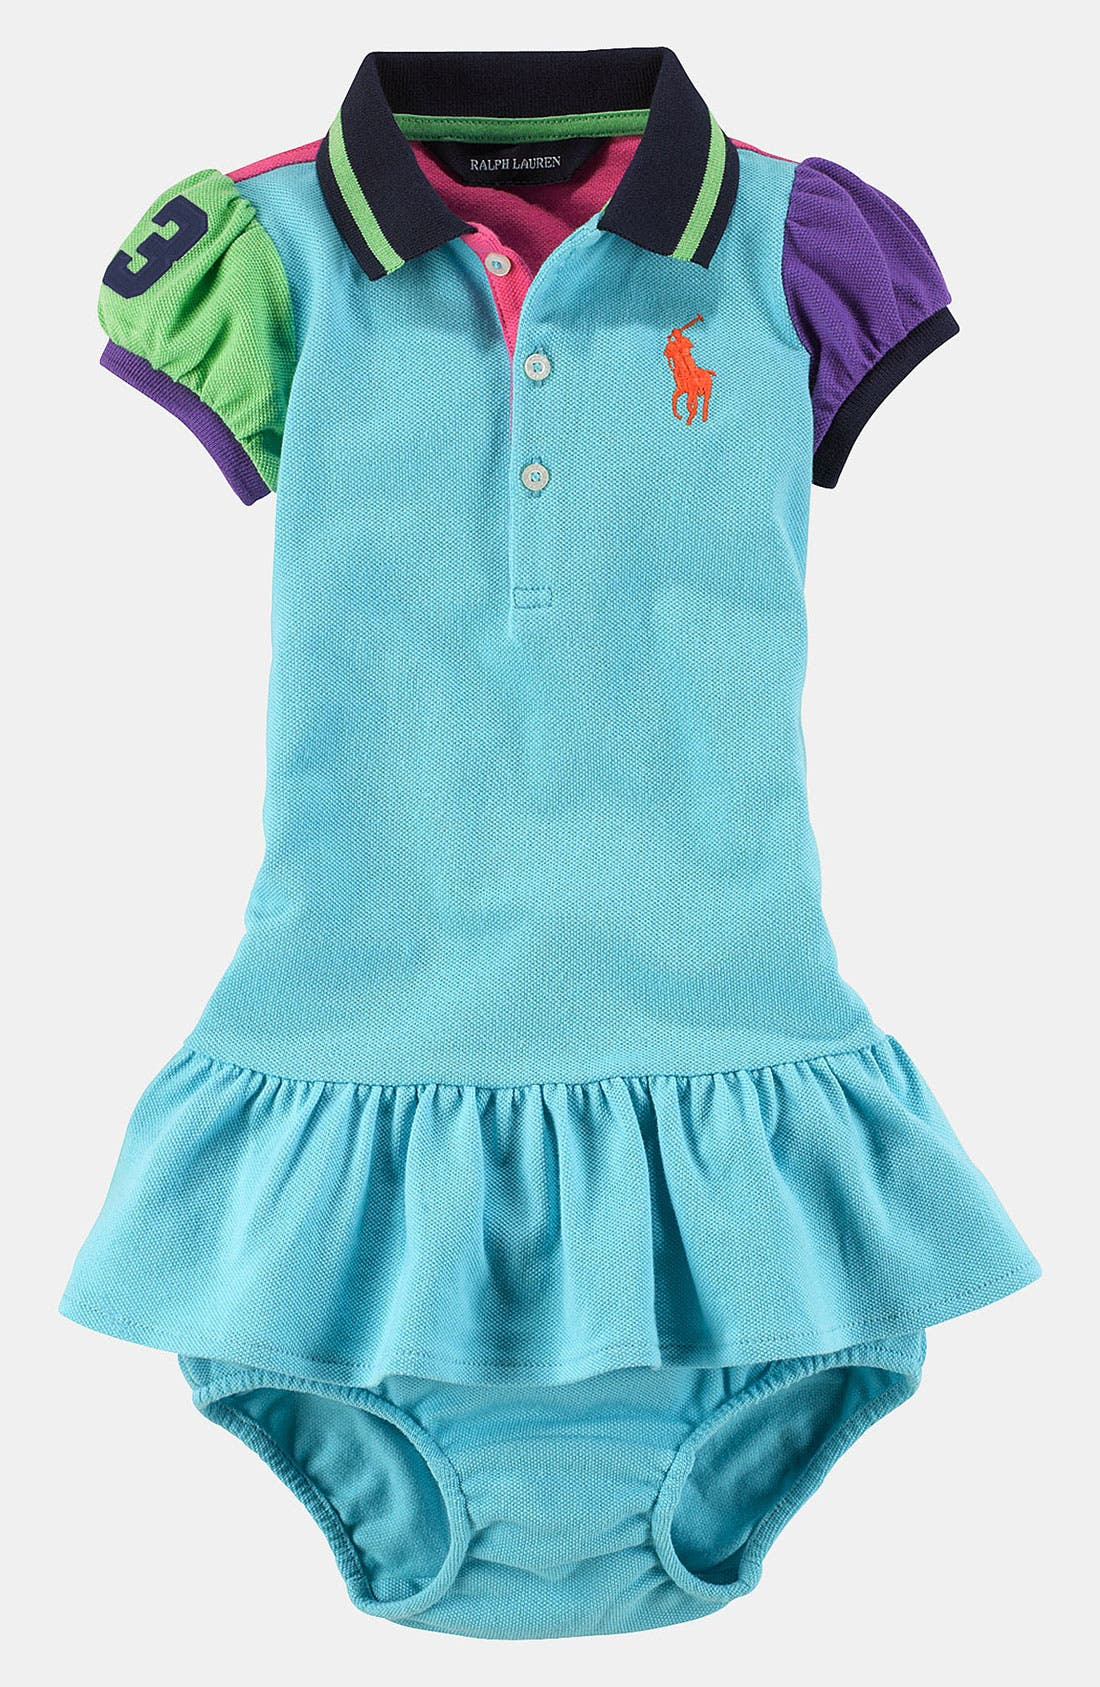 Alternate Image 1 Selected - Ralph Lauren Colorblock Dress & Bloomers (Infant)